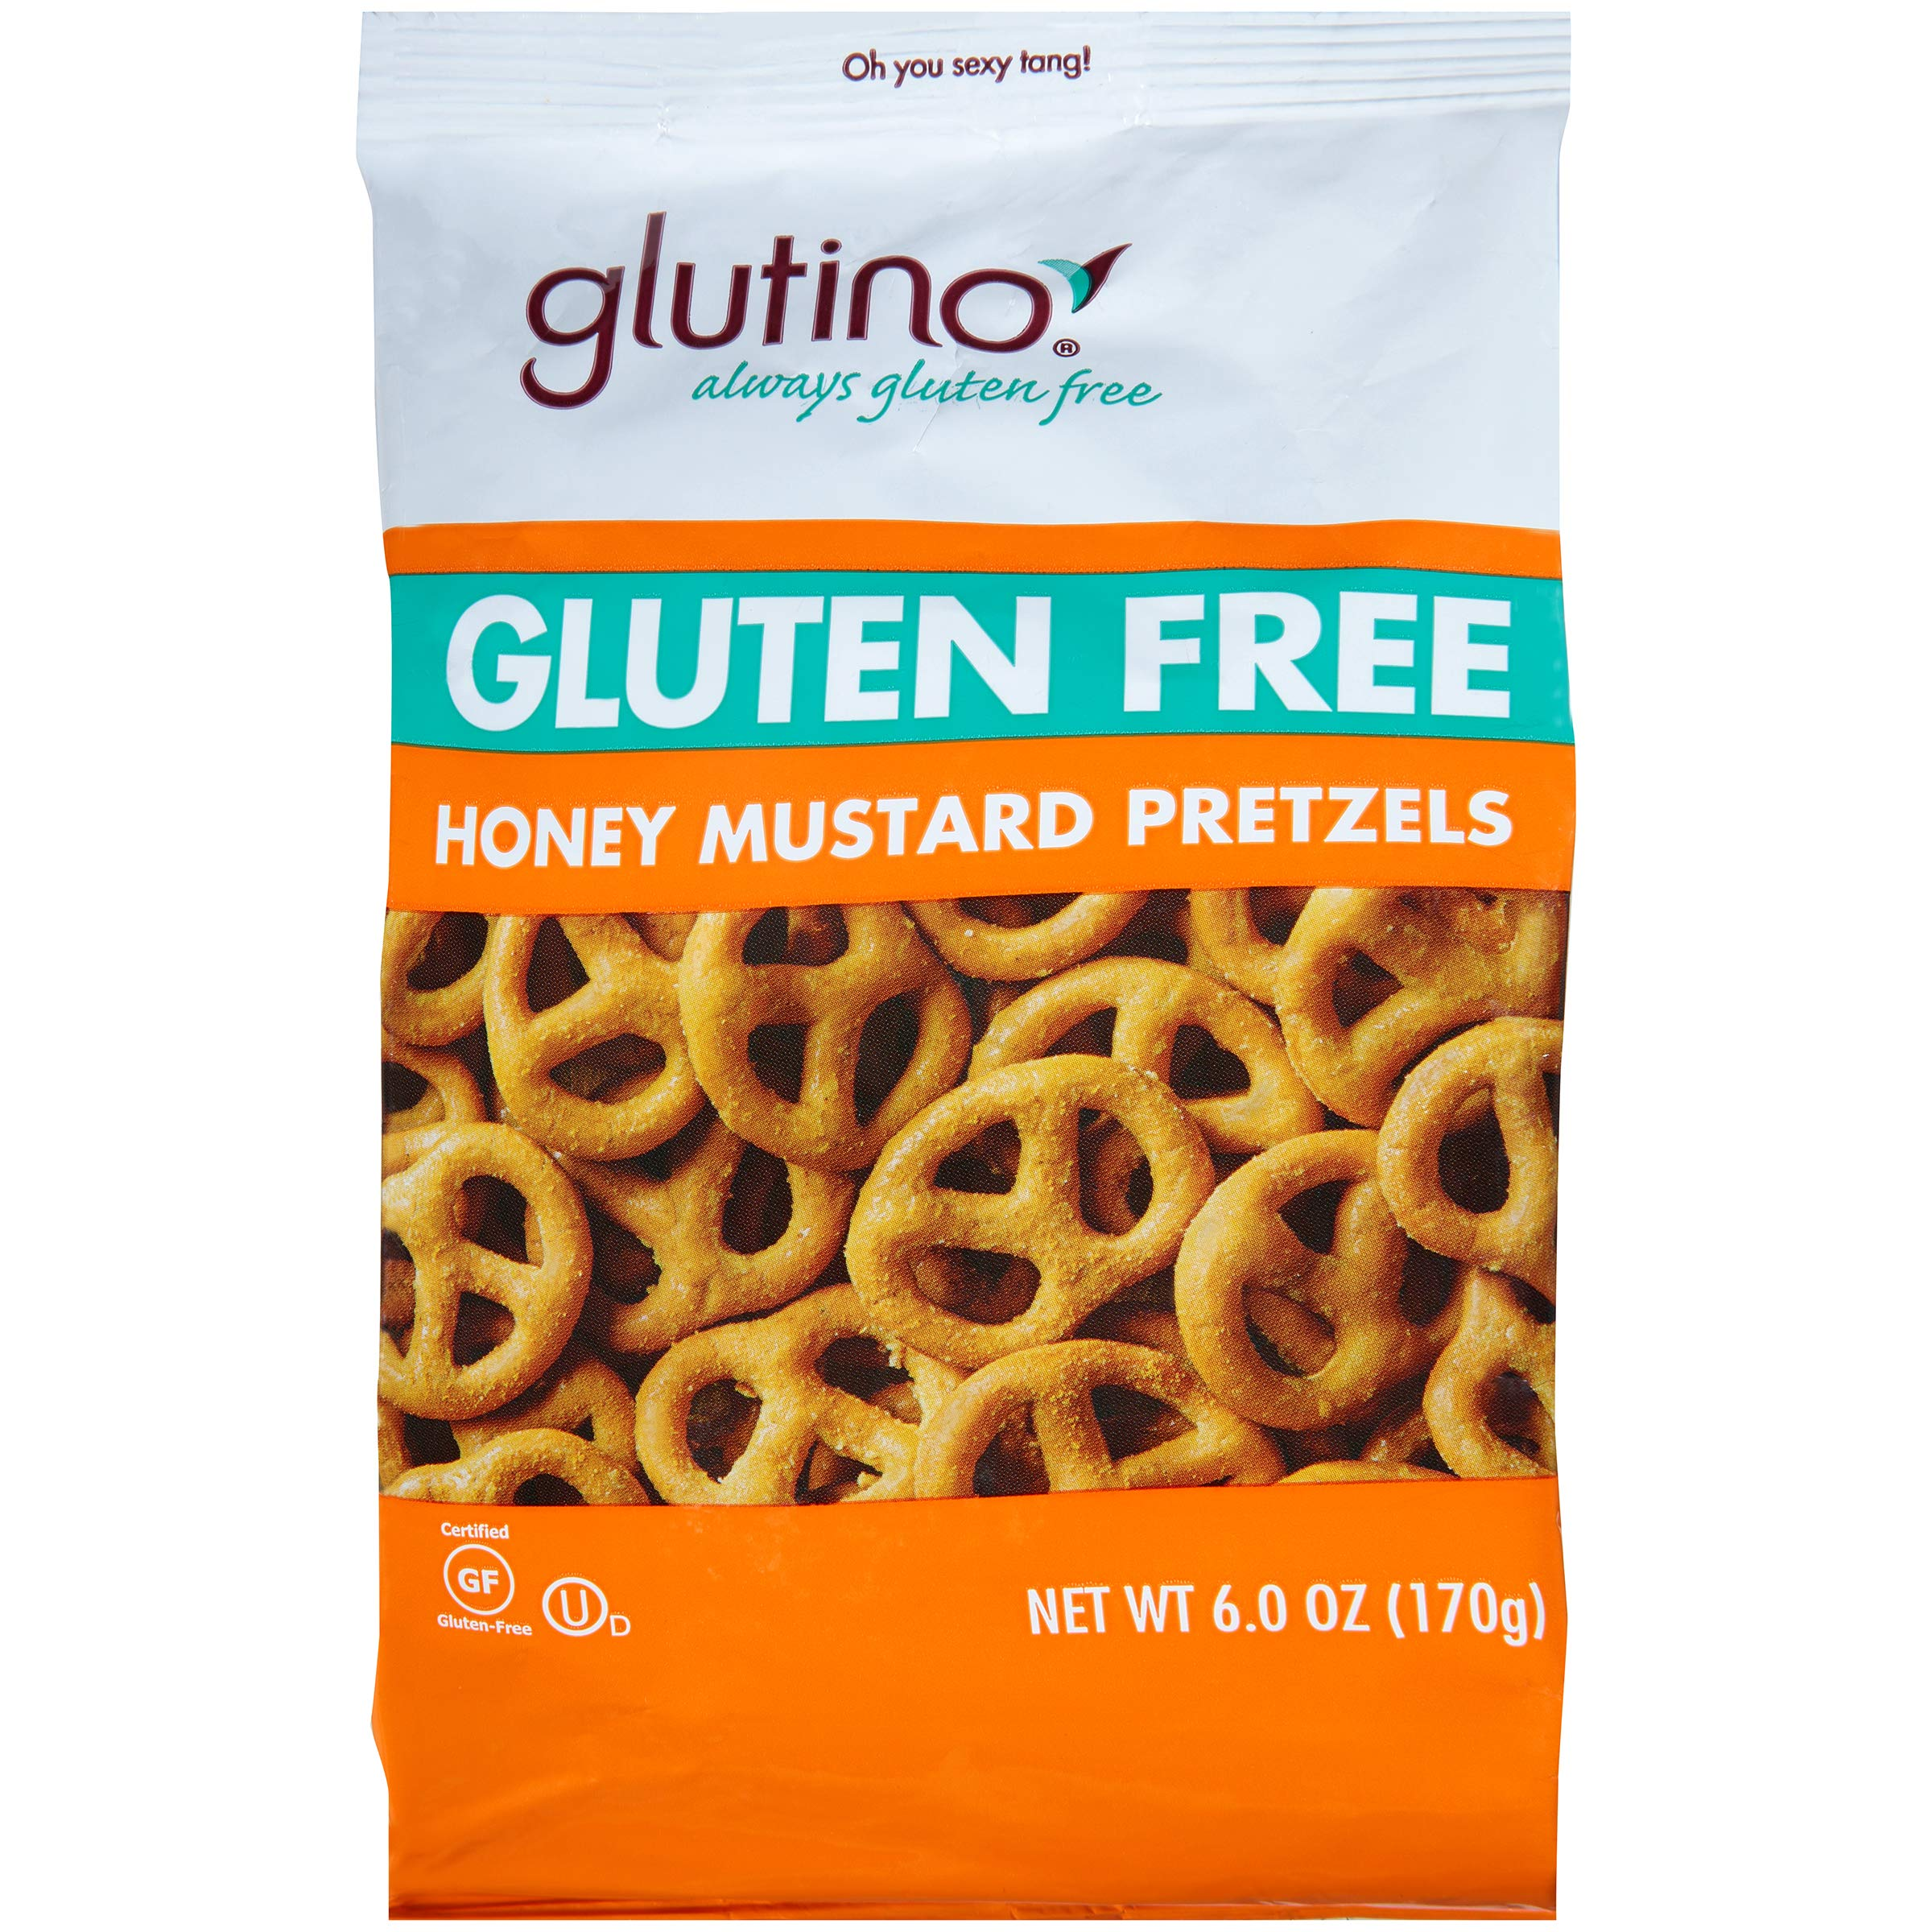 Glutino Gluten Free Pretzels, Honey Mustard, Delicious Everyday Snack, 6 Ounce